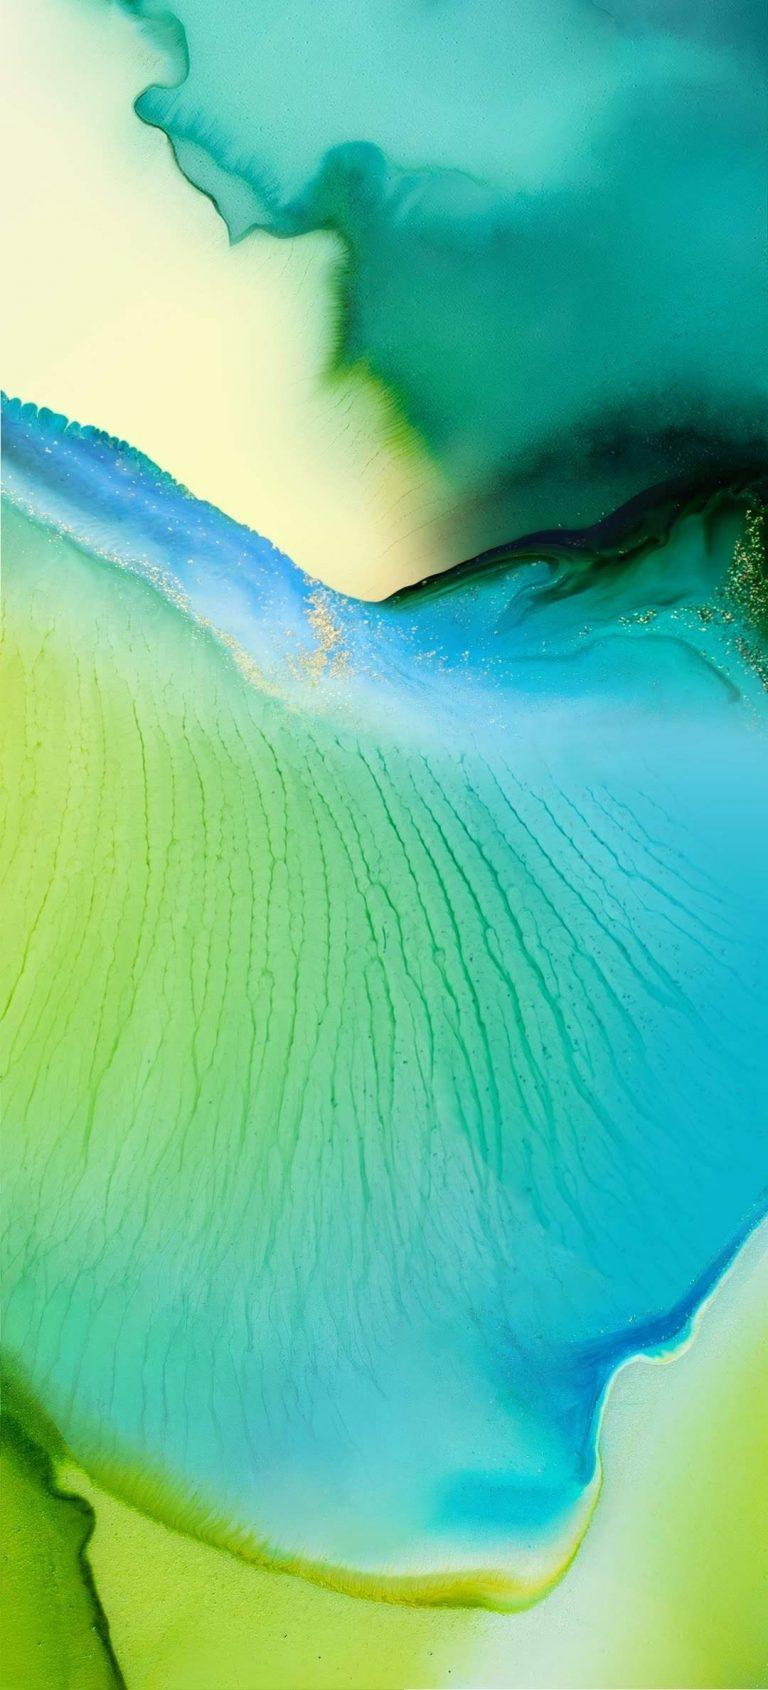 Vivo X50 Pro Stock Wallpaper [1080x2376] - 04